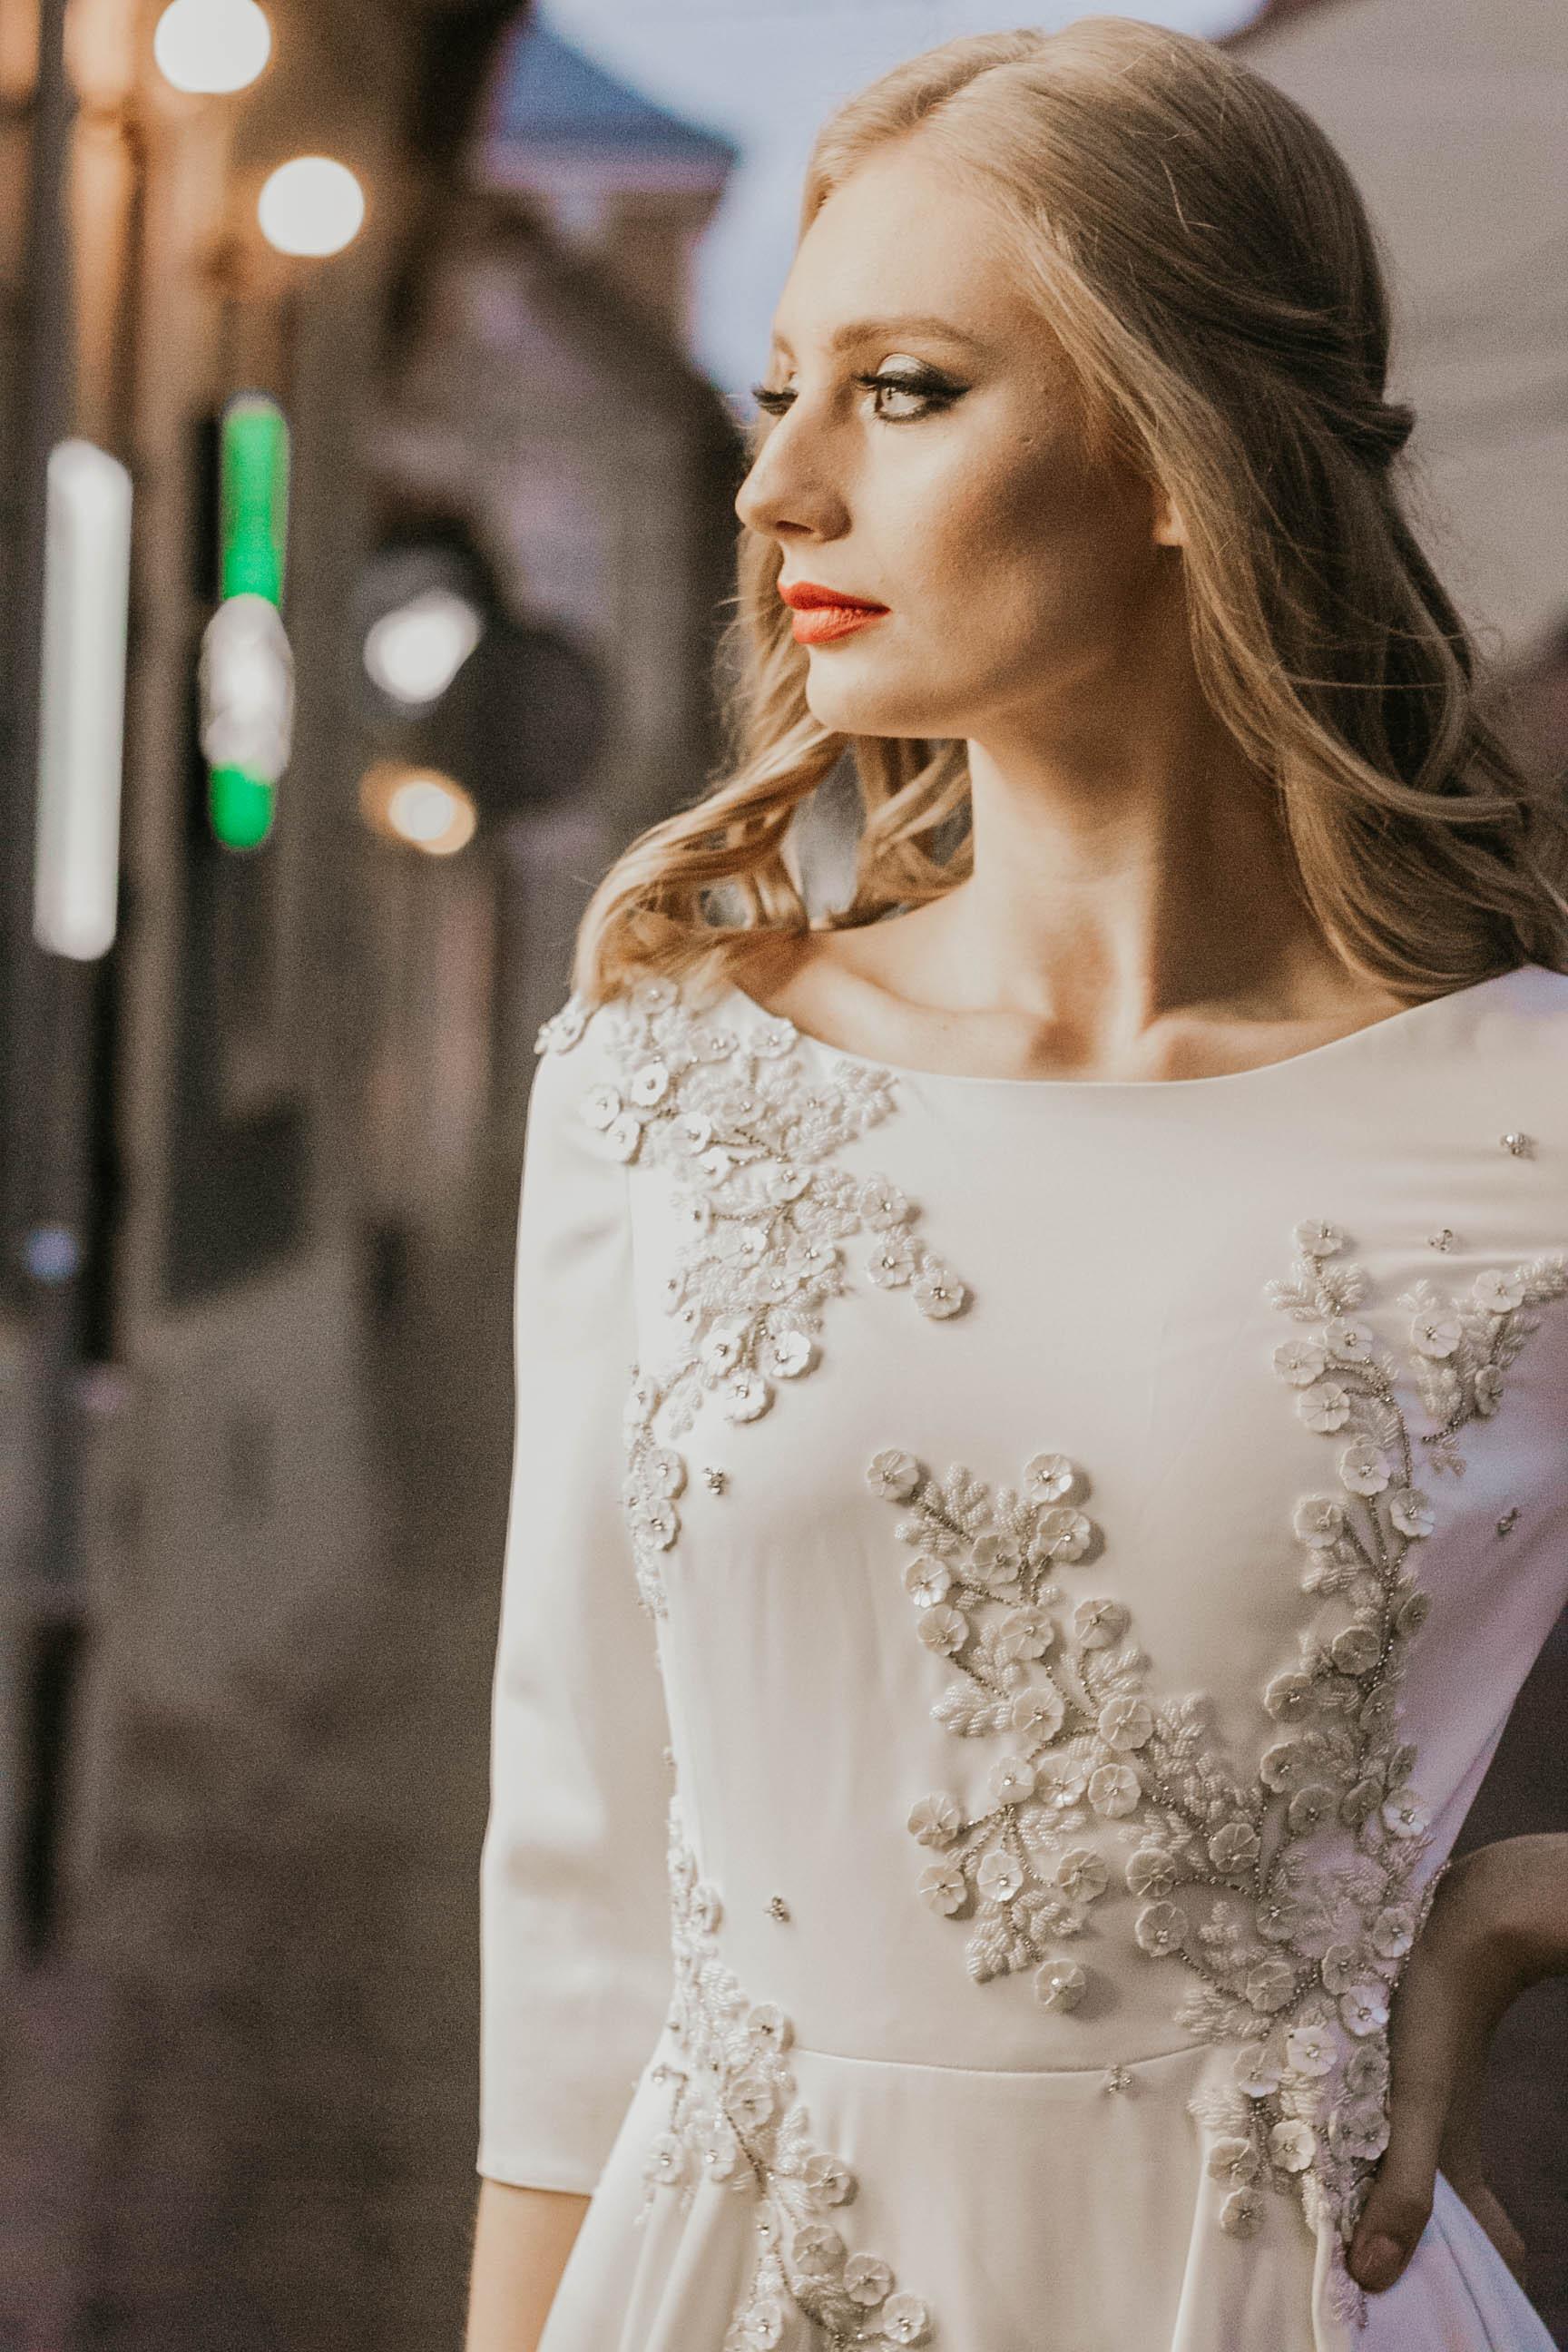 Try on Wedding Dresses